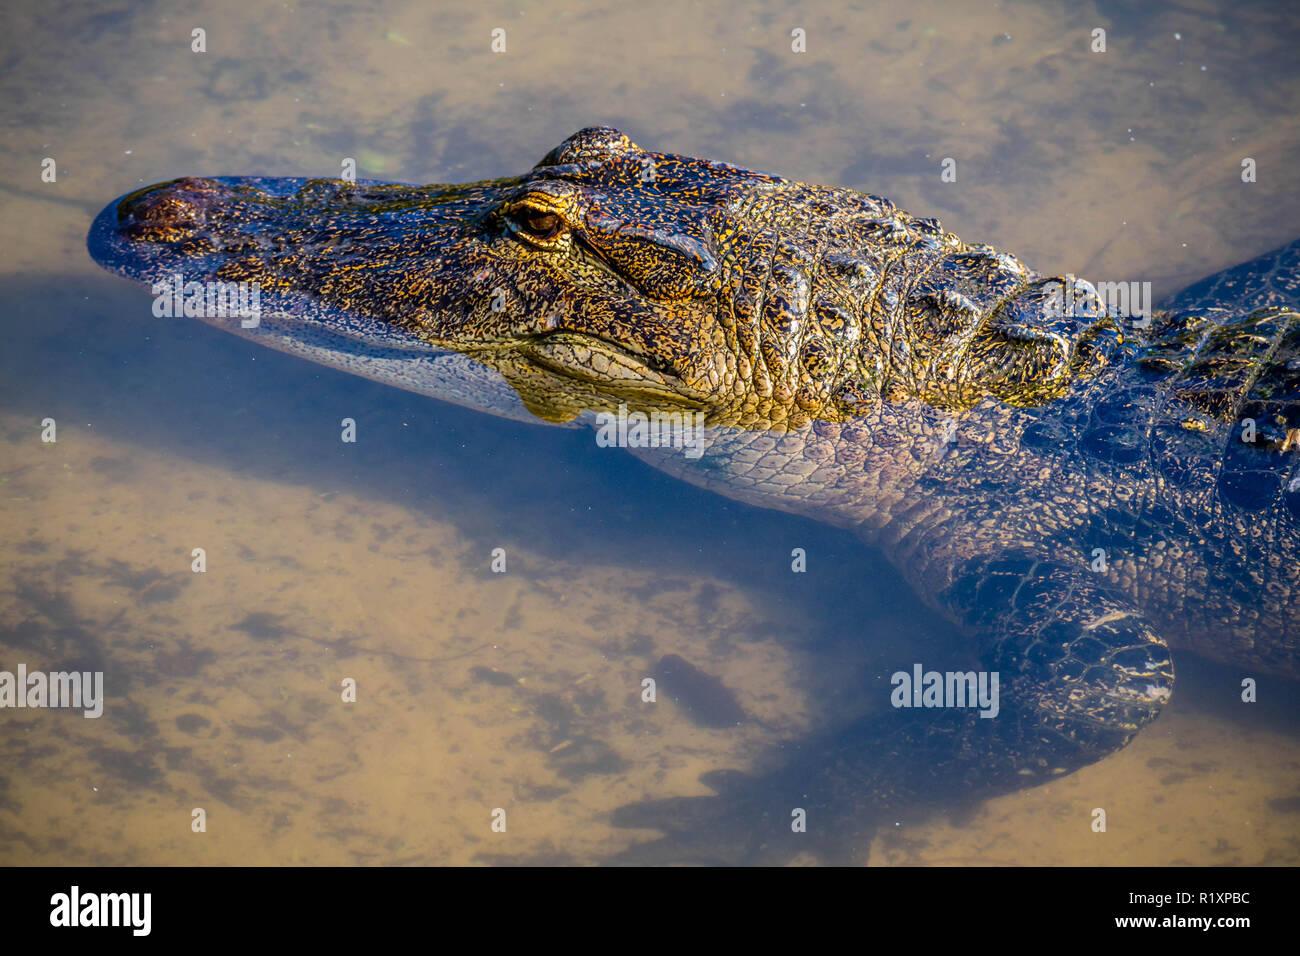 A large American Alligator in Orlando, Florida - Stock Image